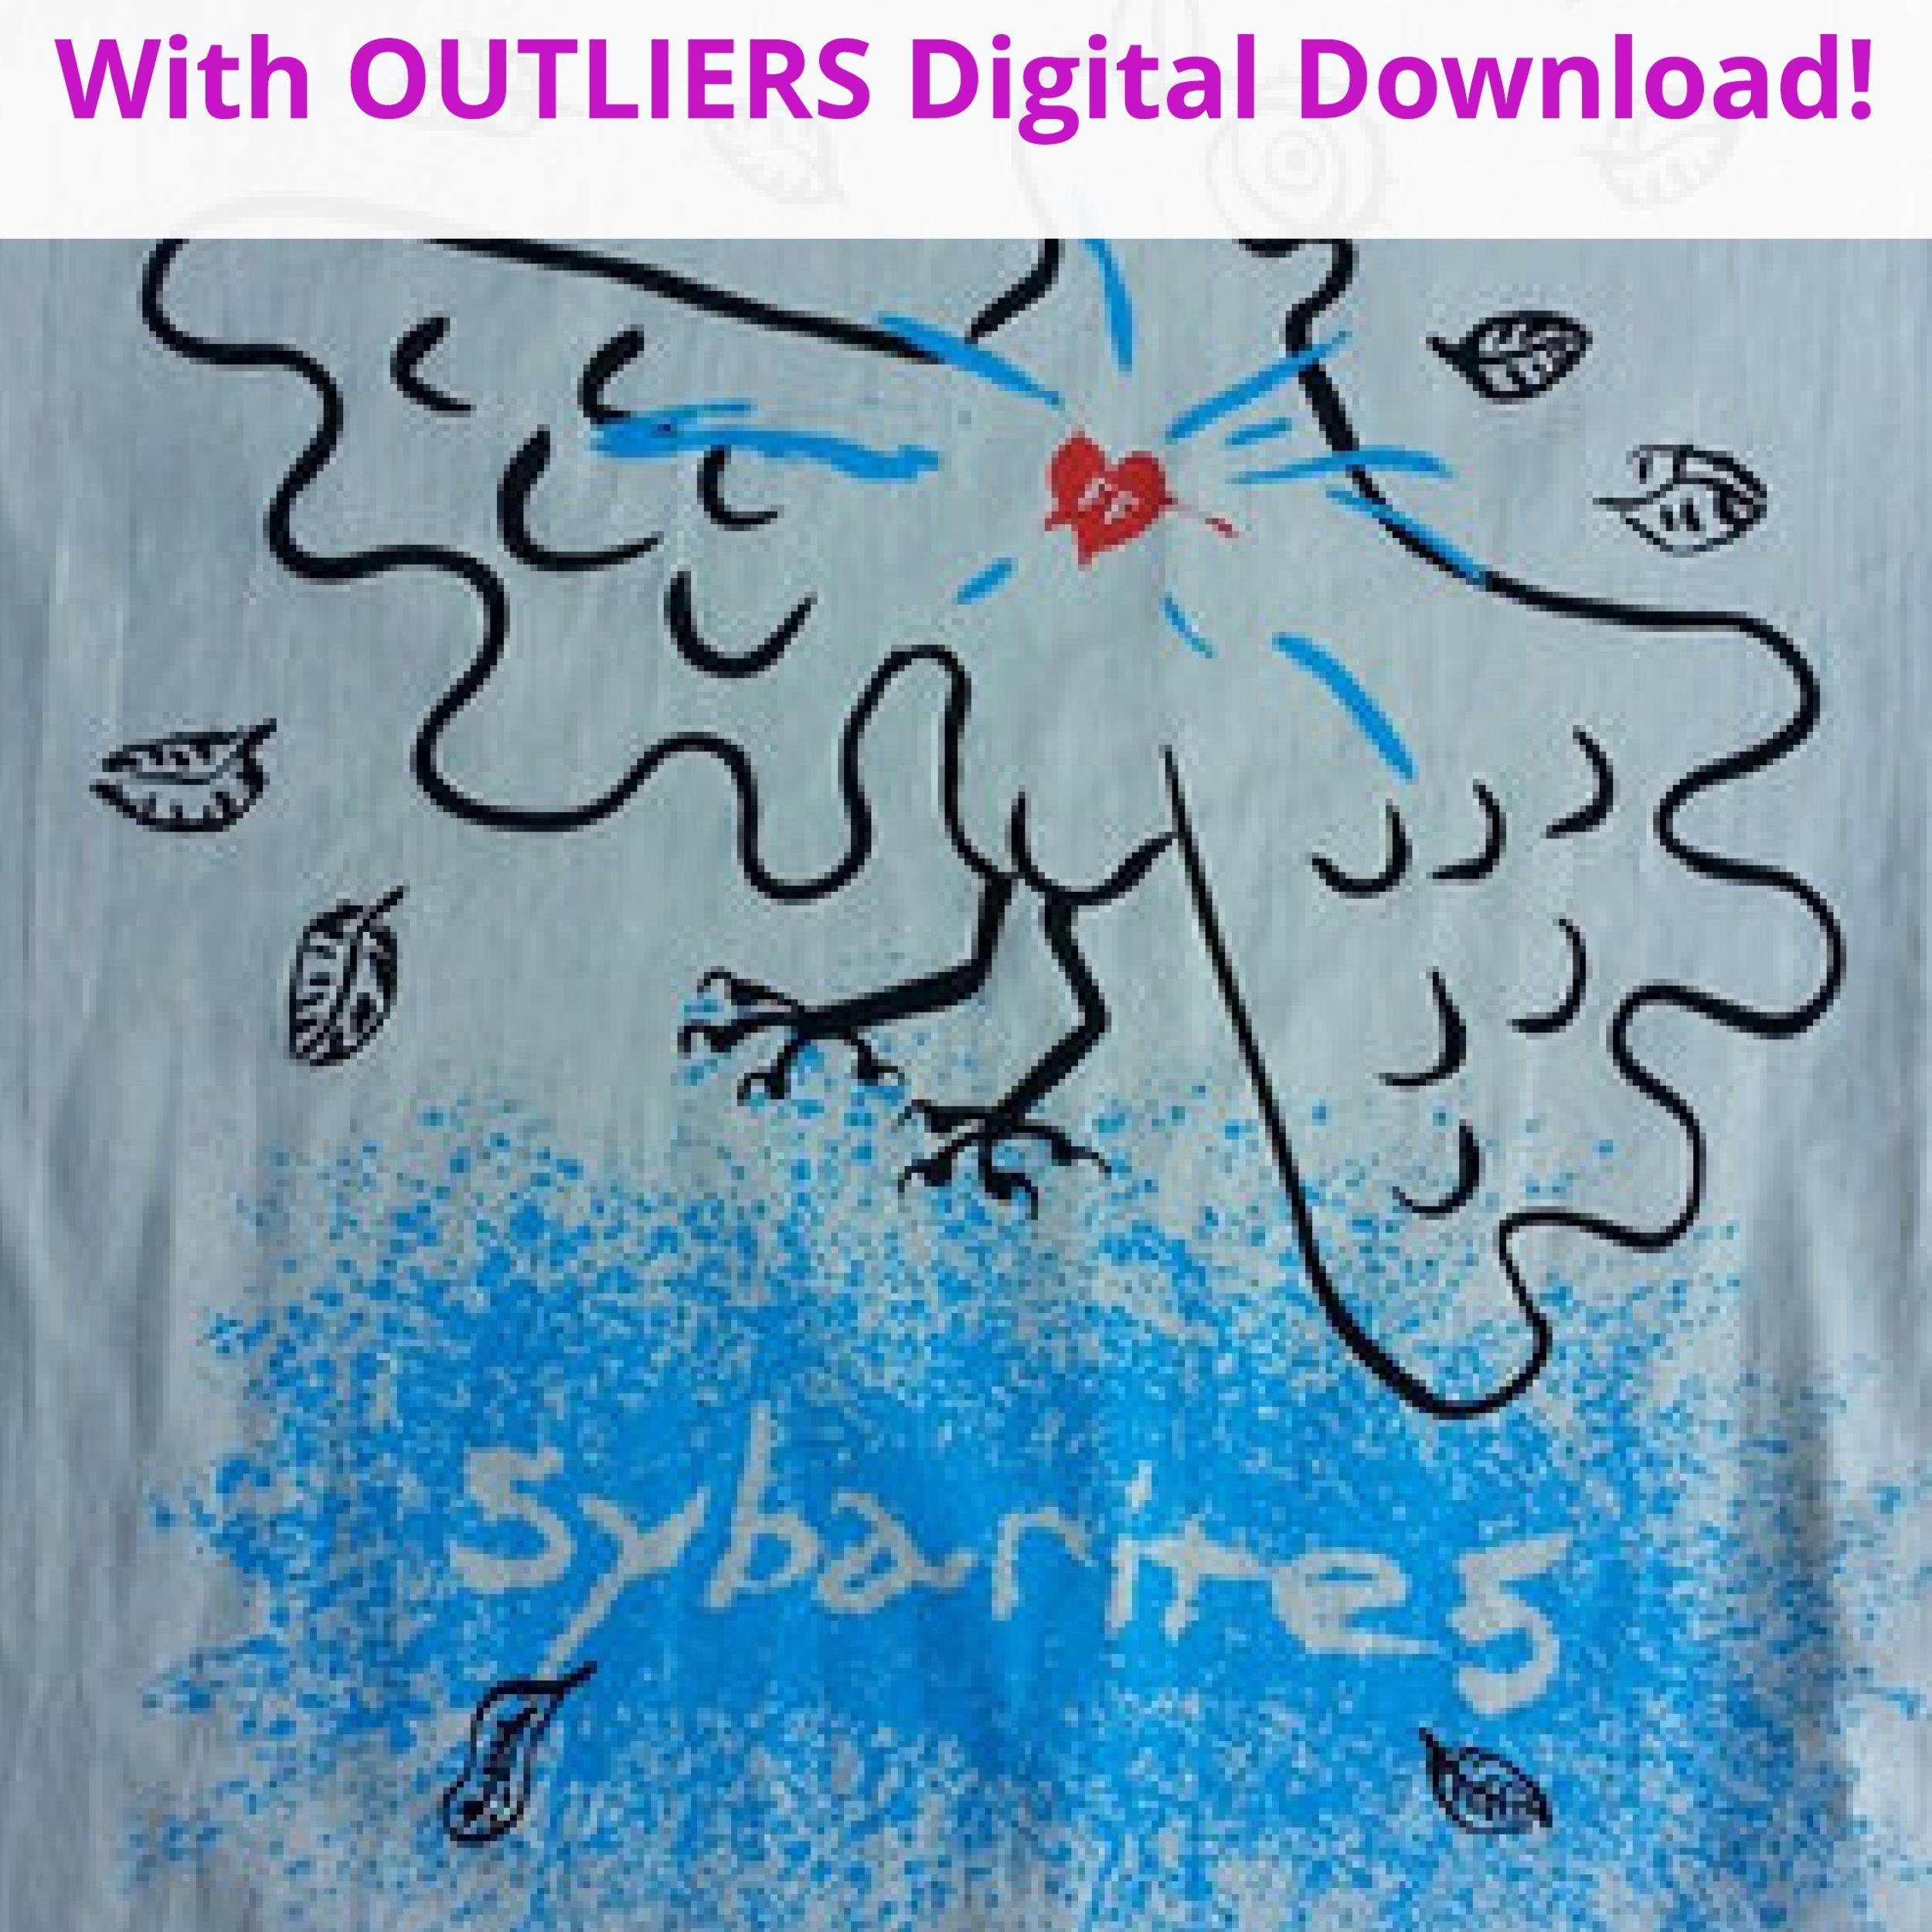 <b>Birdie<br></b><small>T-shirt + OUTLIERS Full Digital Download<br></small><b>$25</b>